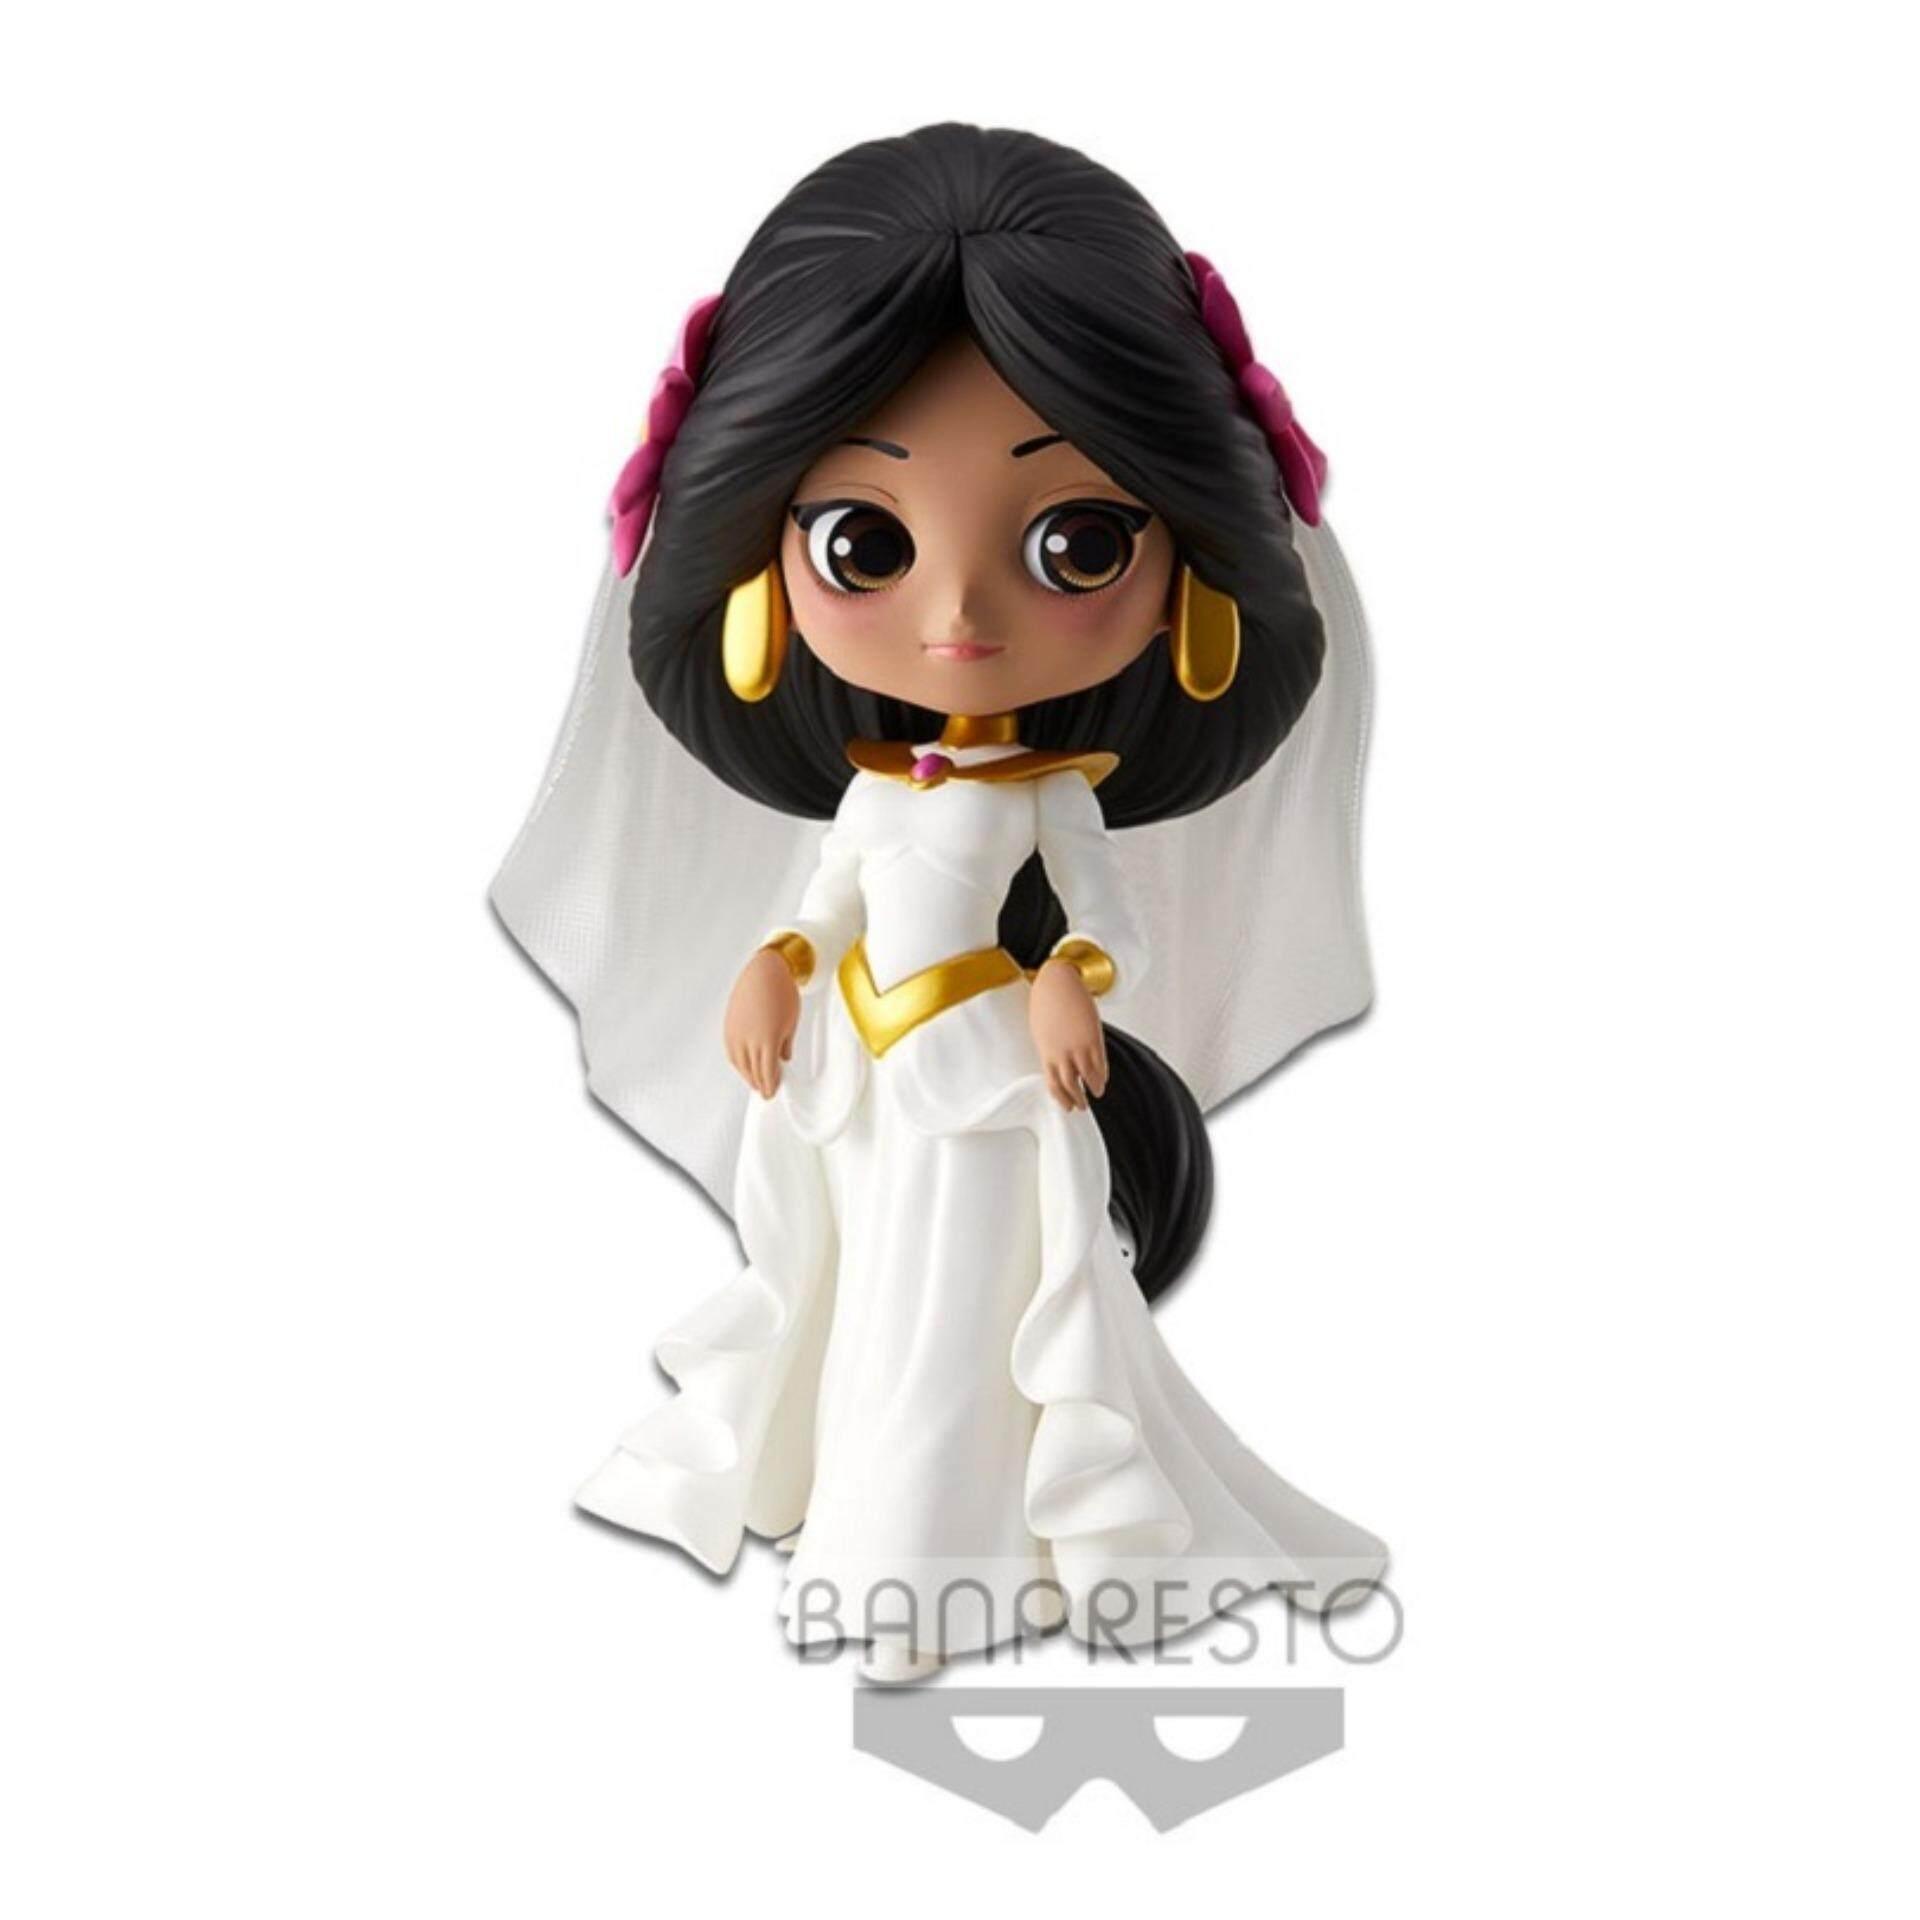 Banpresto Q Posket Disney Princess Figure Normal Version - Jasmine Dreamy Style Toys for boys